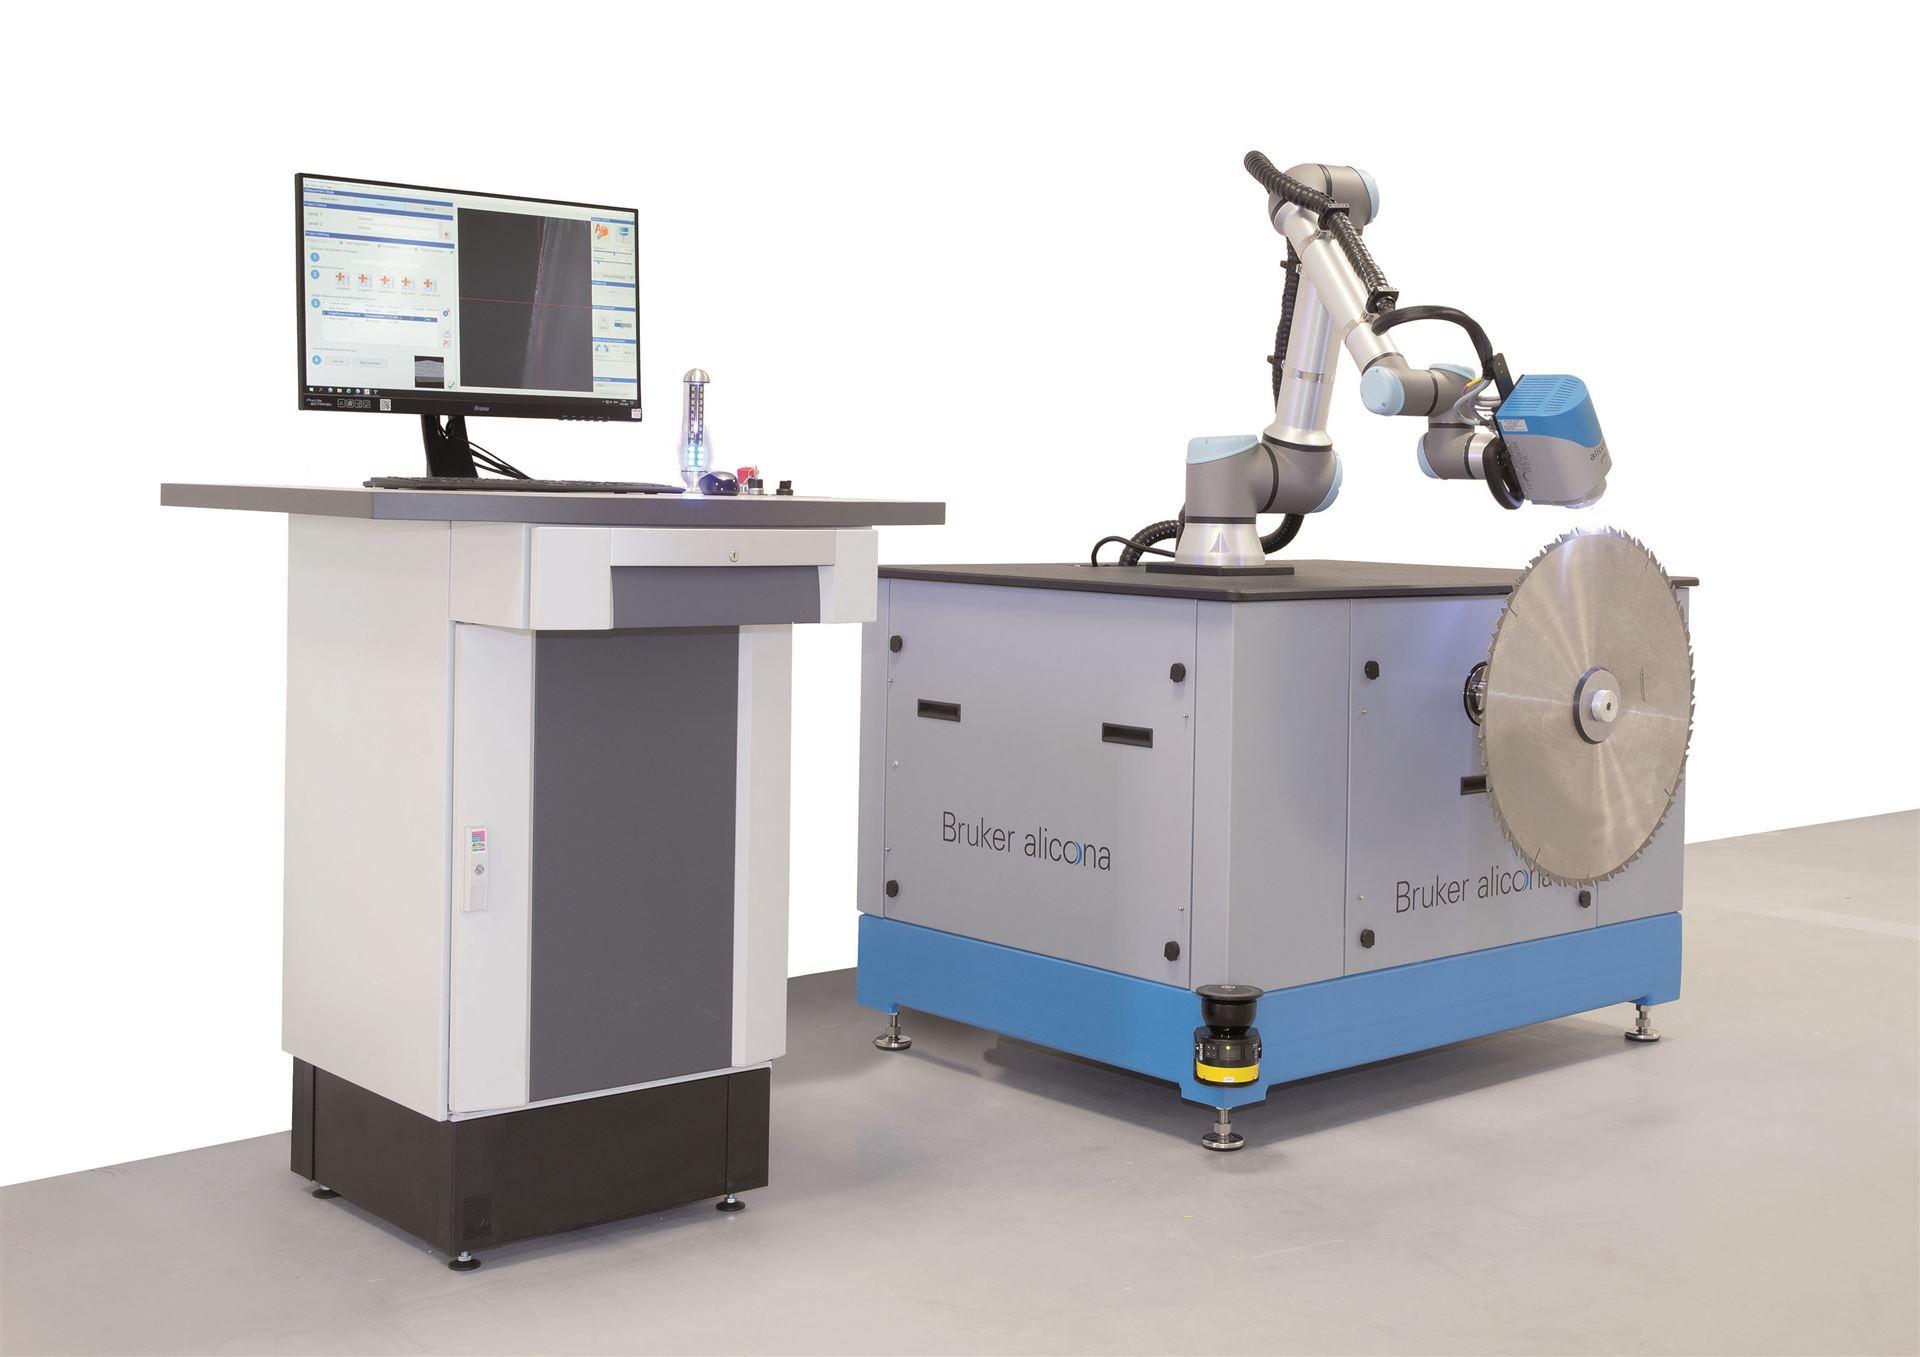 Cobots - How to combine optical 3D metrology and collaborative robotics